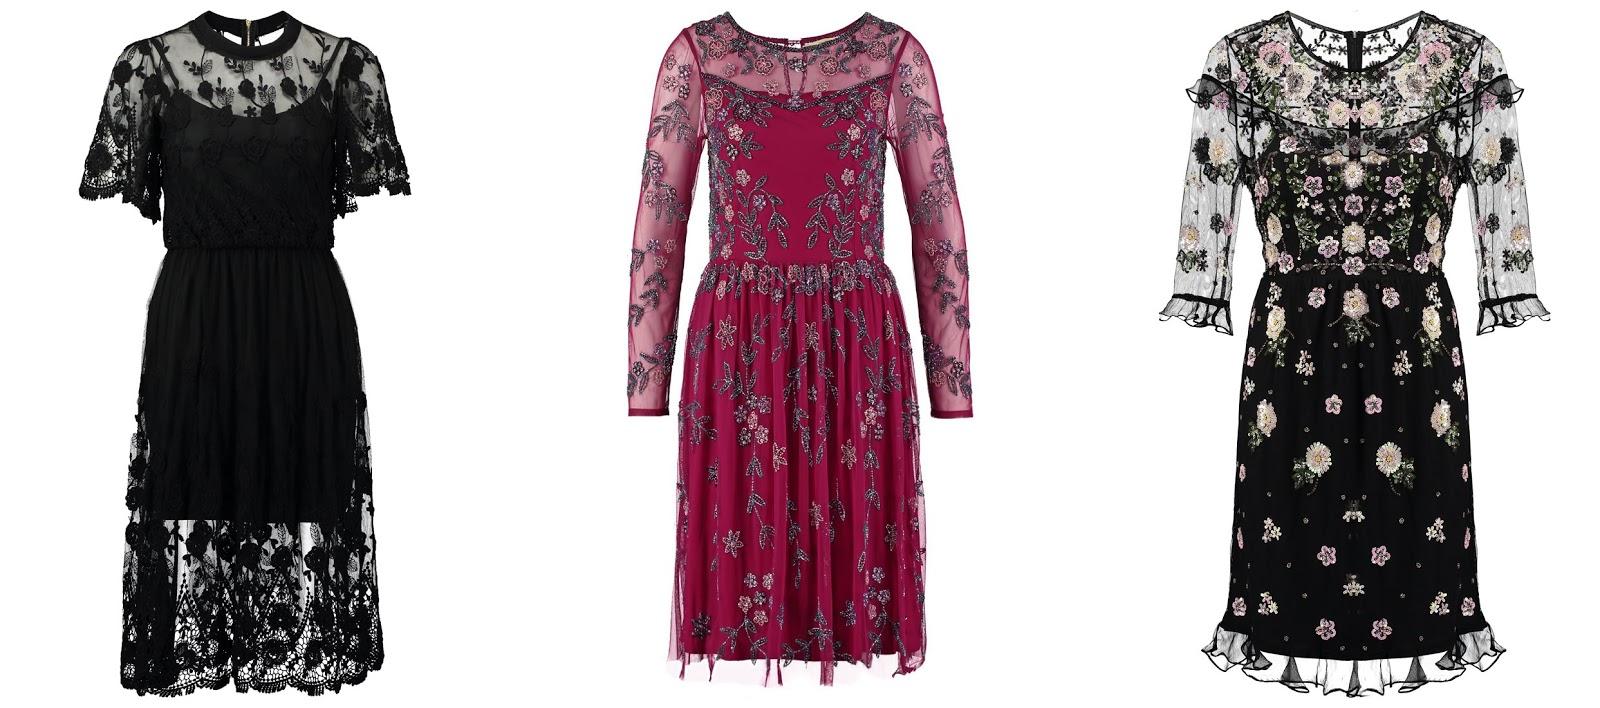 72c831557f Prom dresses - quick review - Jestem Kasia Blog